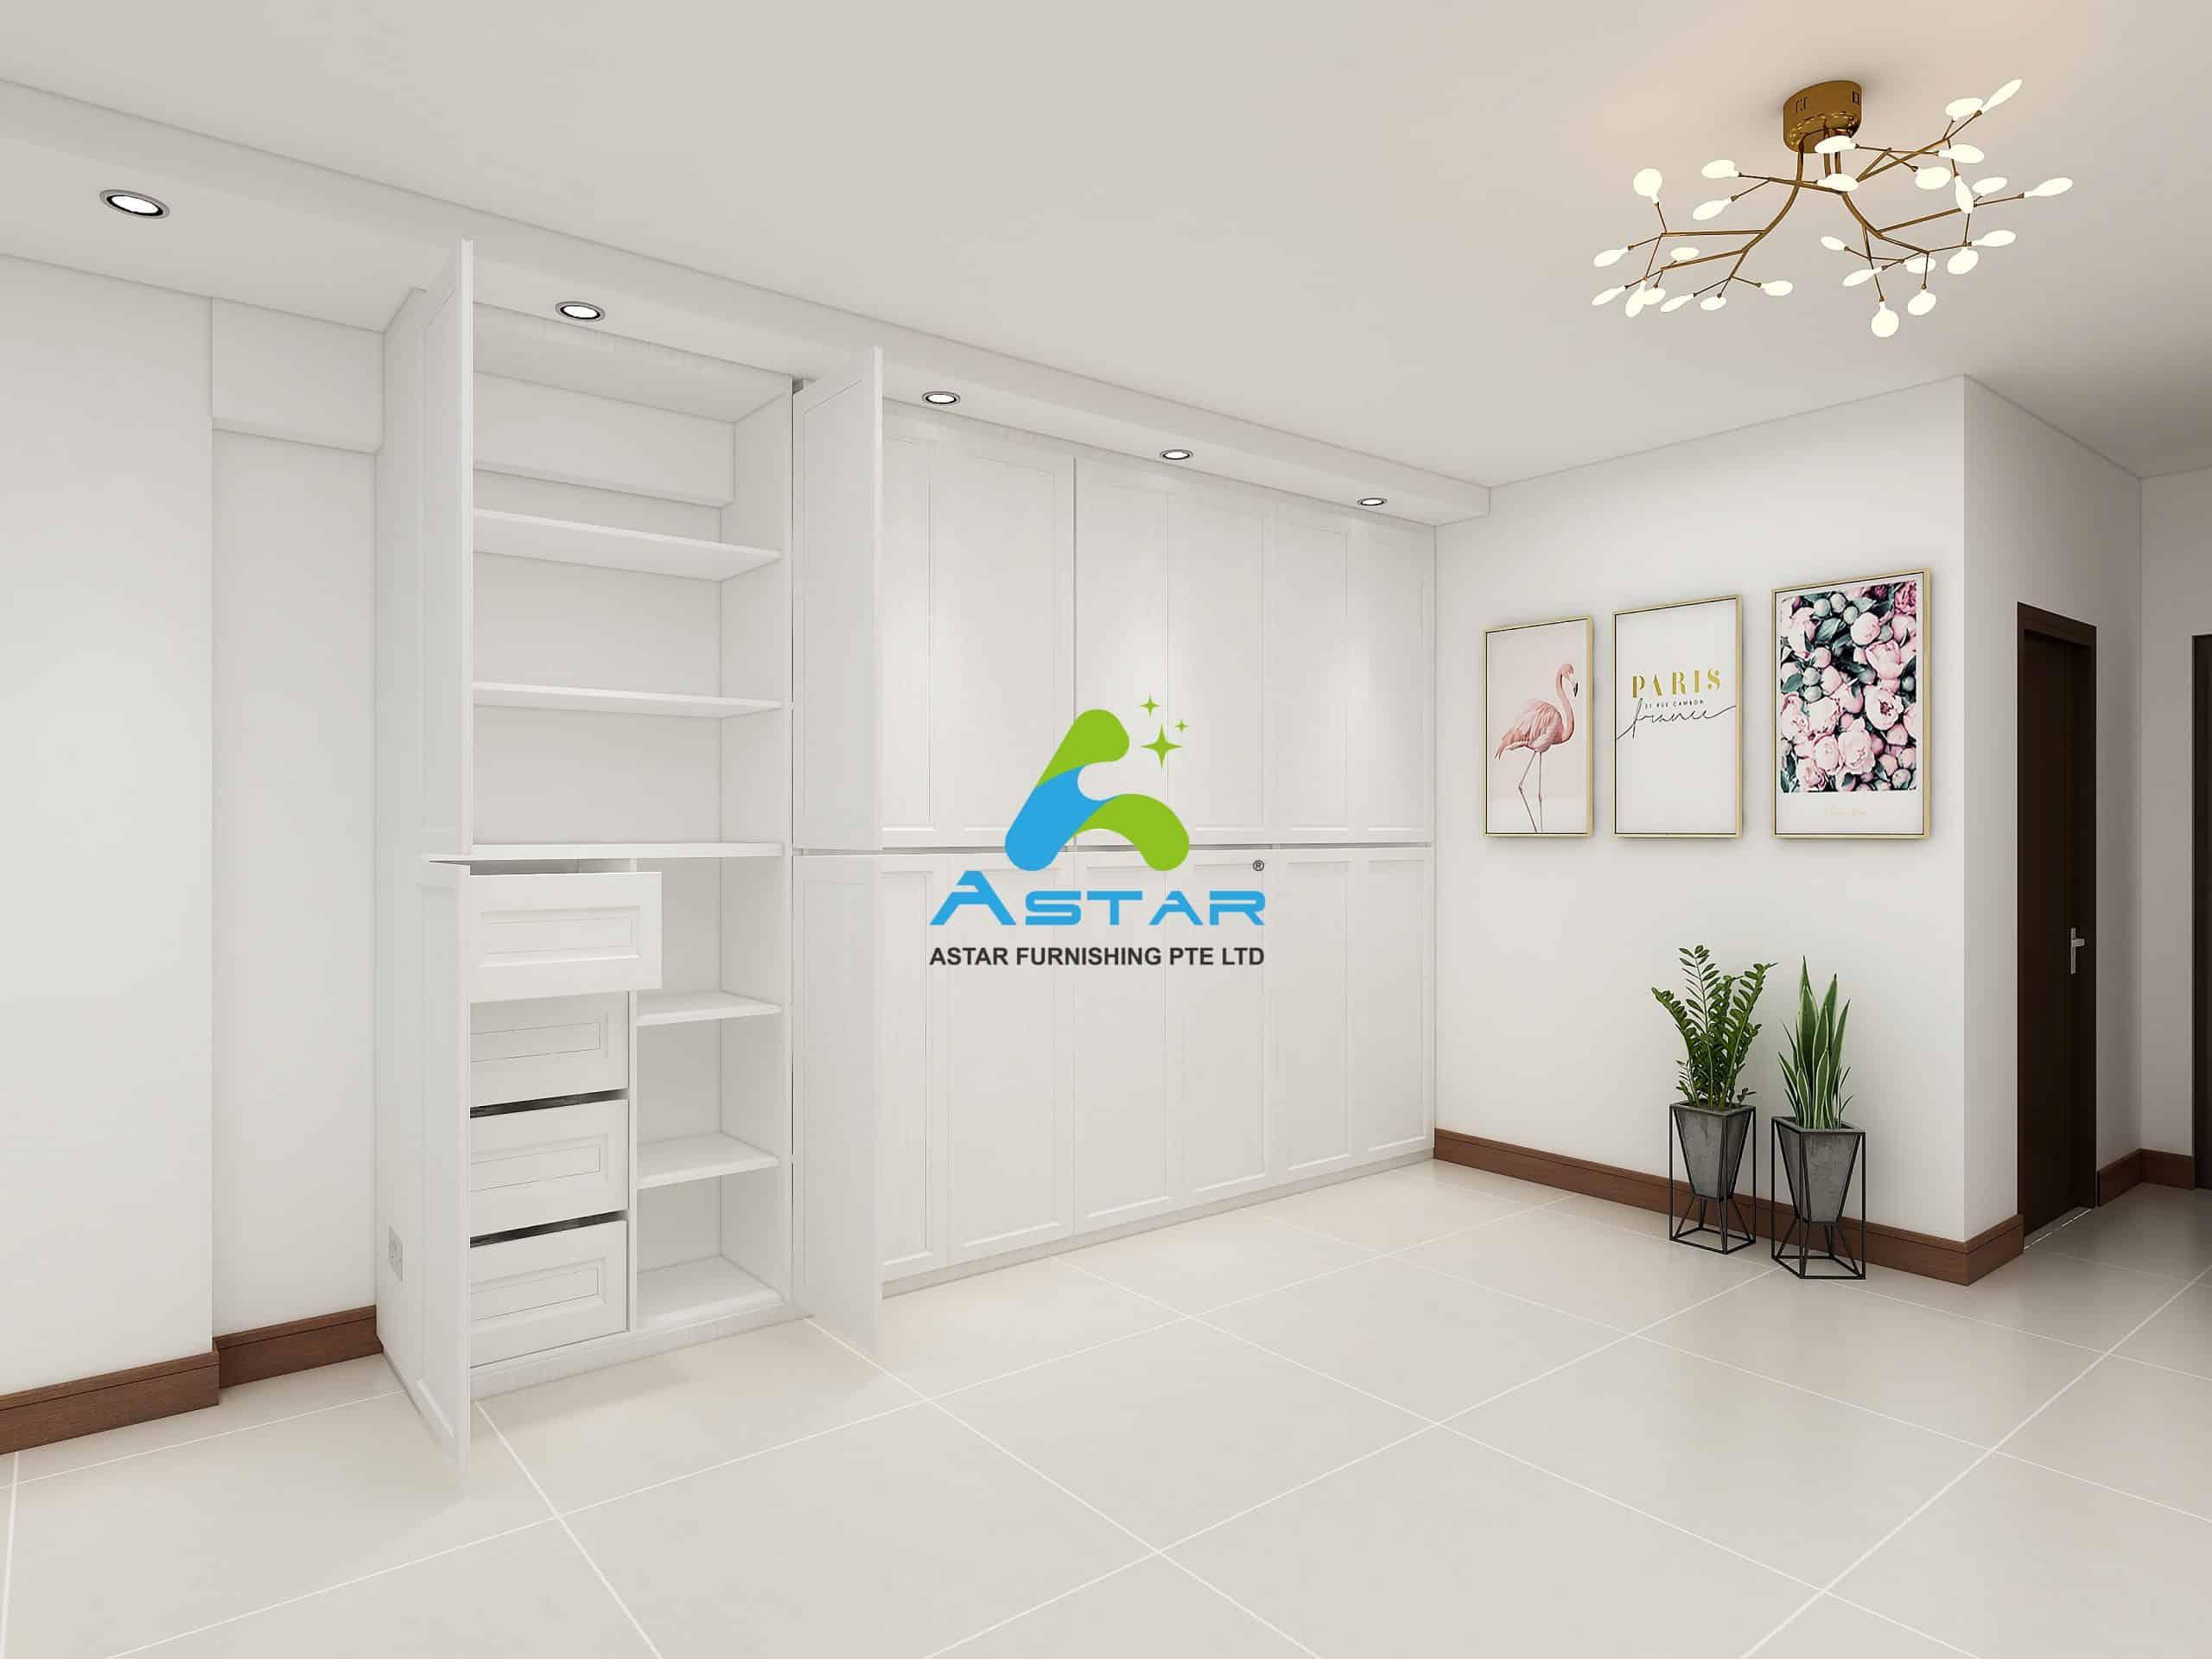 a star furnishing aluminium projects 12. Blk 325B Sumang Walk 058 scaled